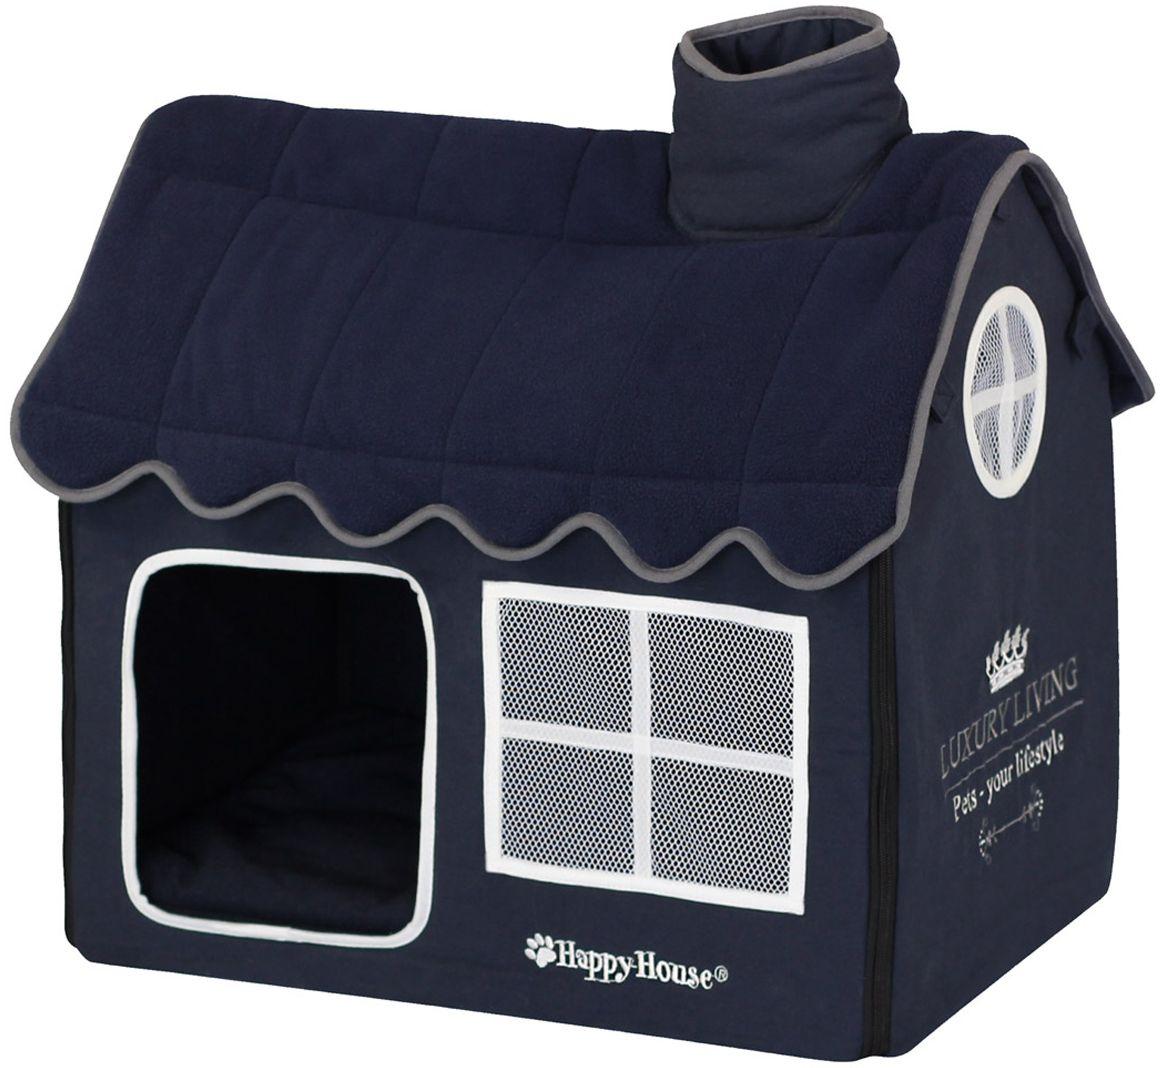 "Домик для домашних животных Happy House ""Luxsury Living"", цвет: темно-синий, 52 х 36 х 49 см  #1"